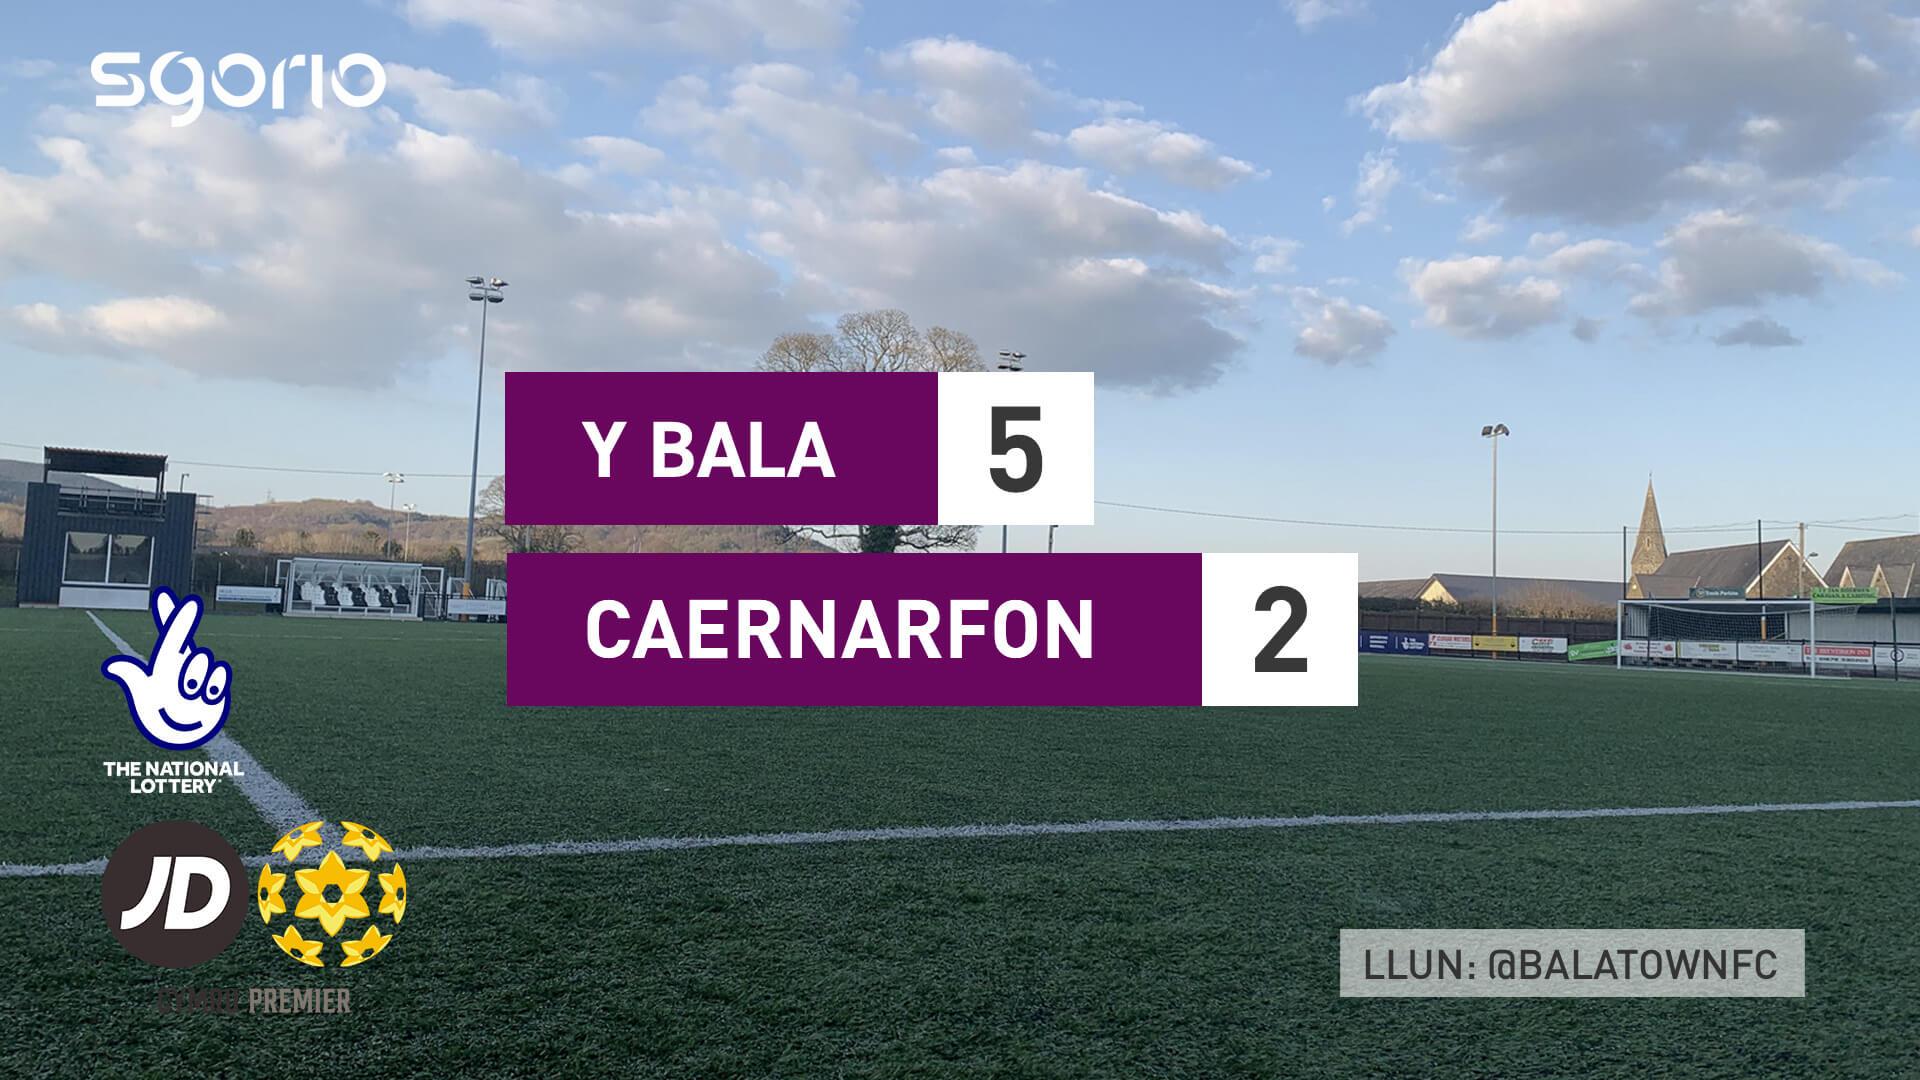 Y Bala 5-2 Caernarfon